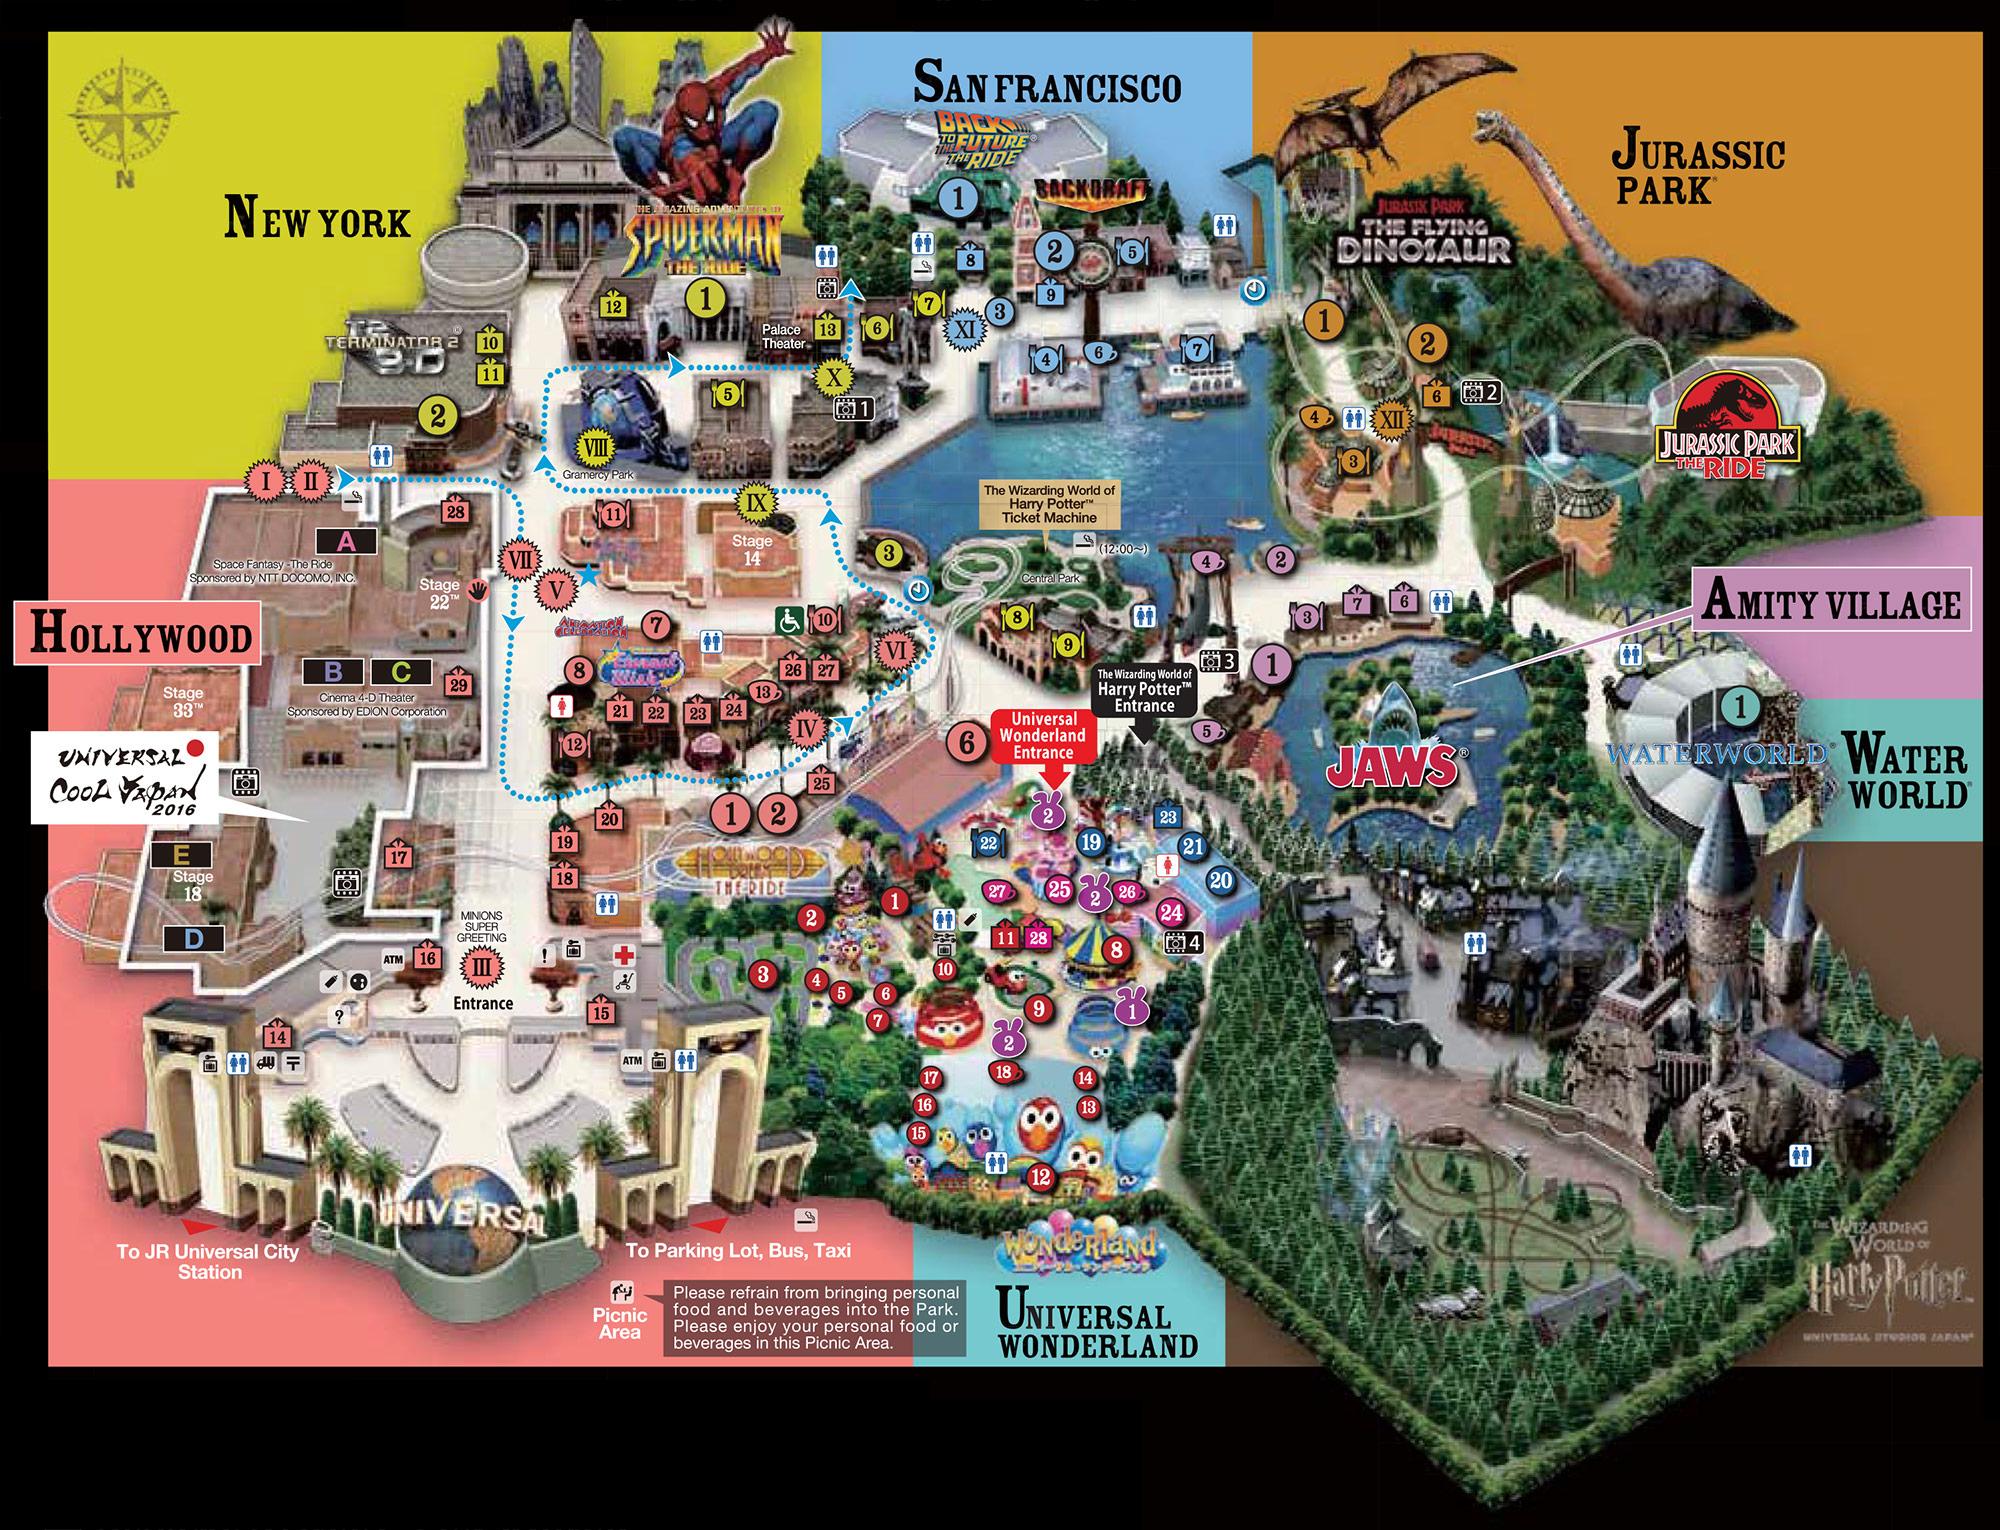 Customer Relationship Management of Universal Studios